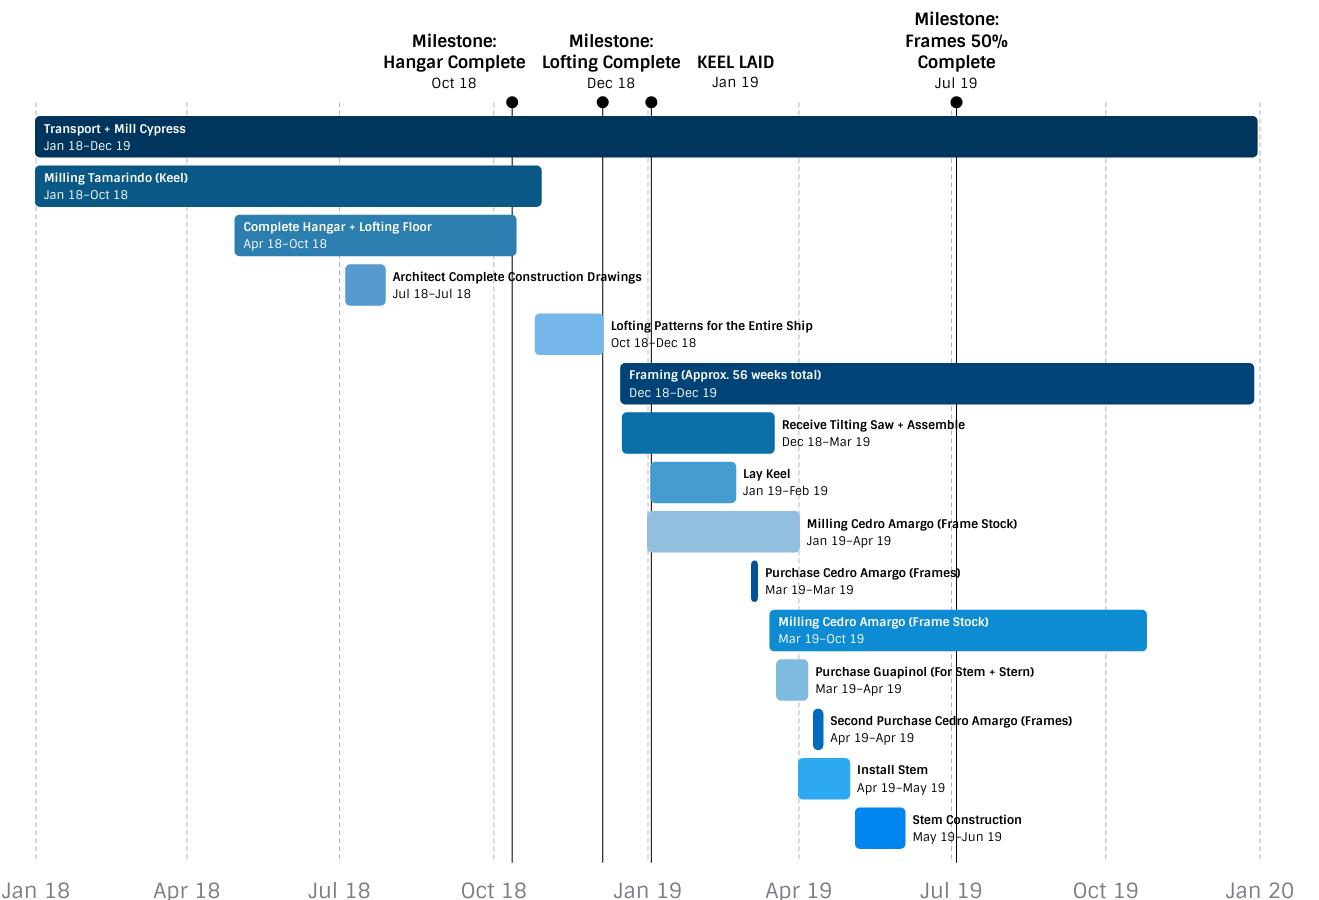 Ceiba_Shipbuilding_Timeline_2019_2020.png